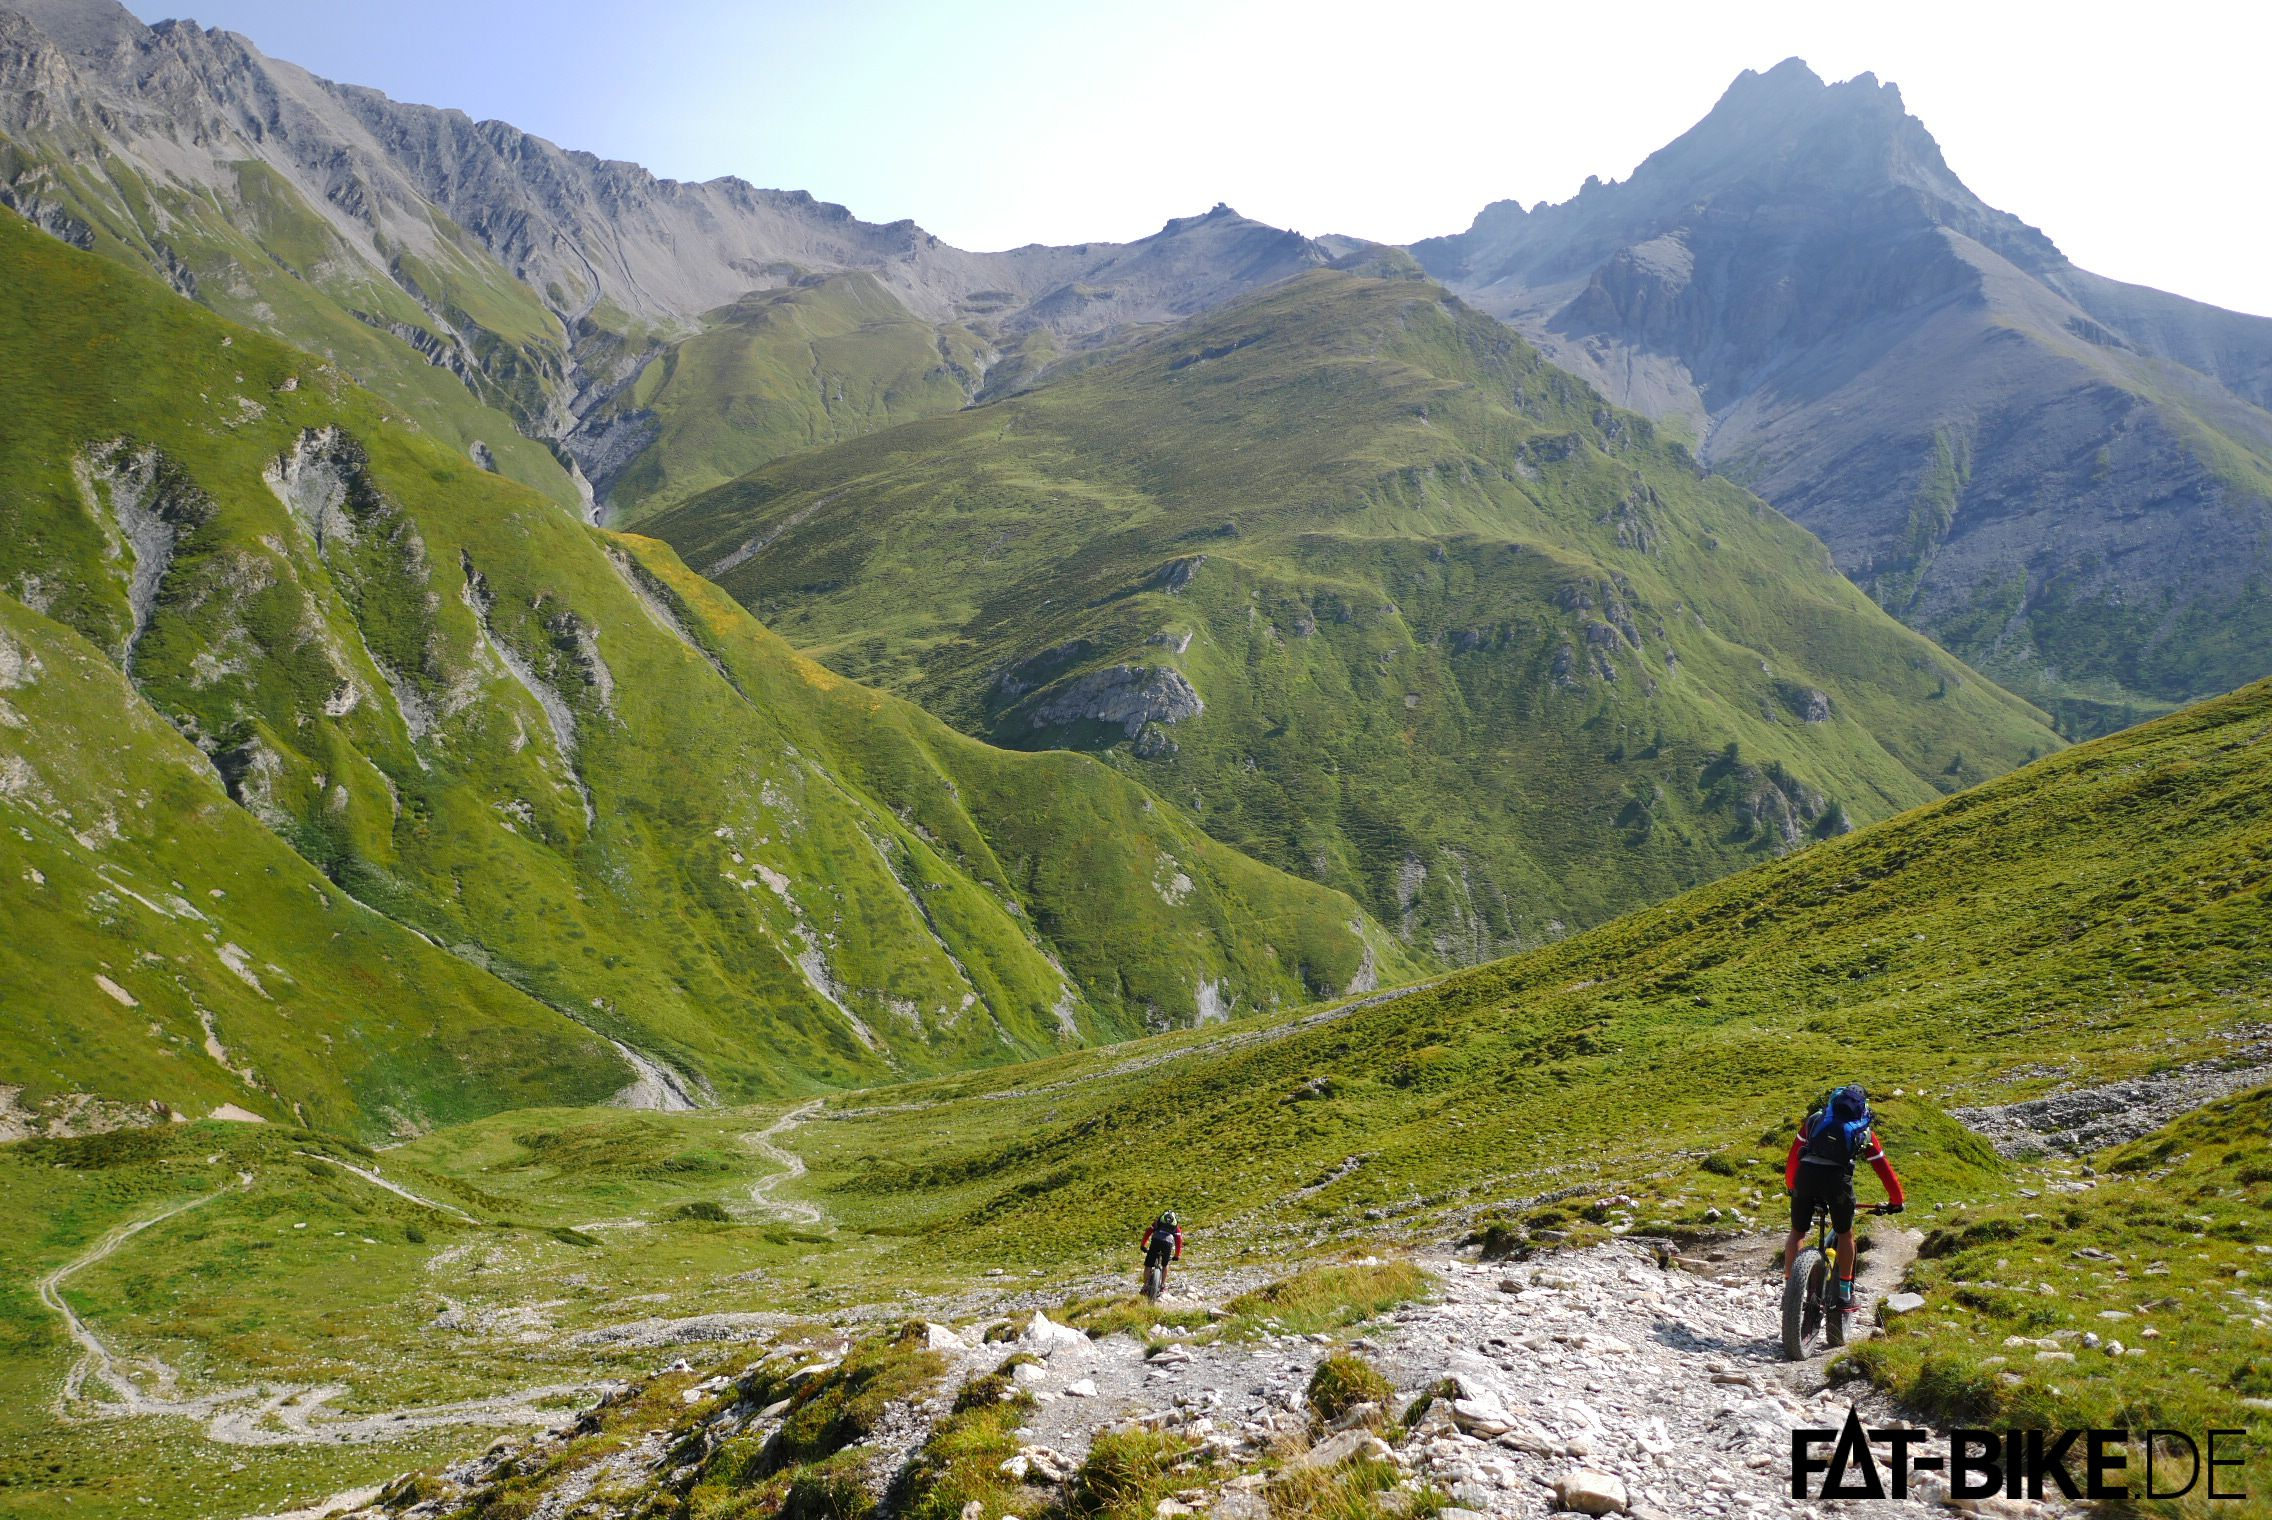 Packender Trail vom Fimberpass hinunter ins Tal